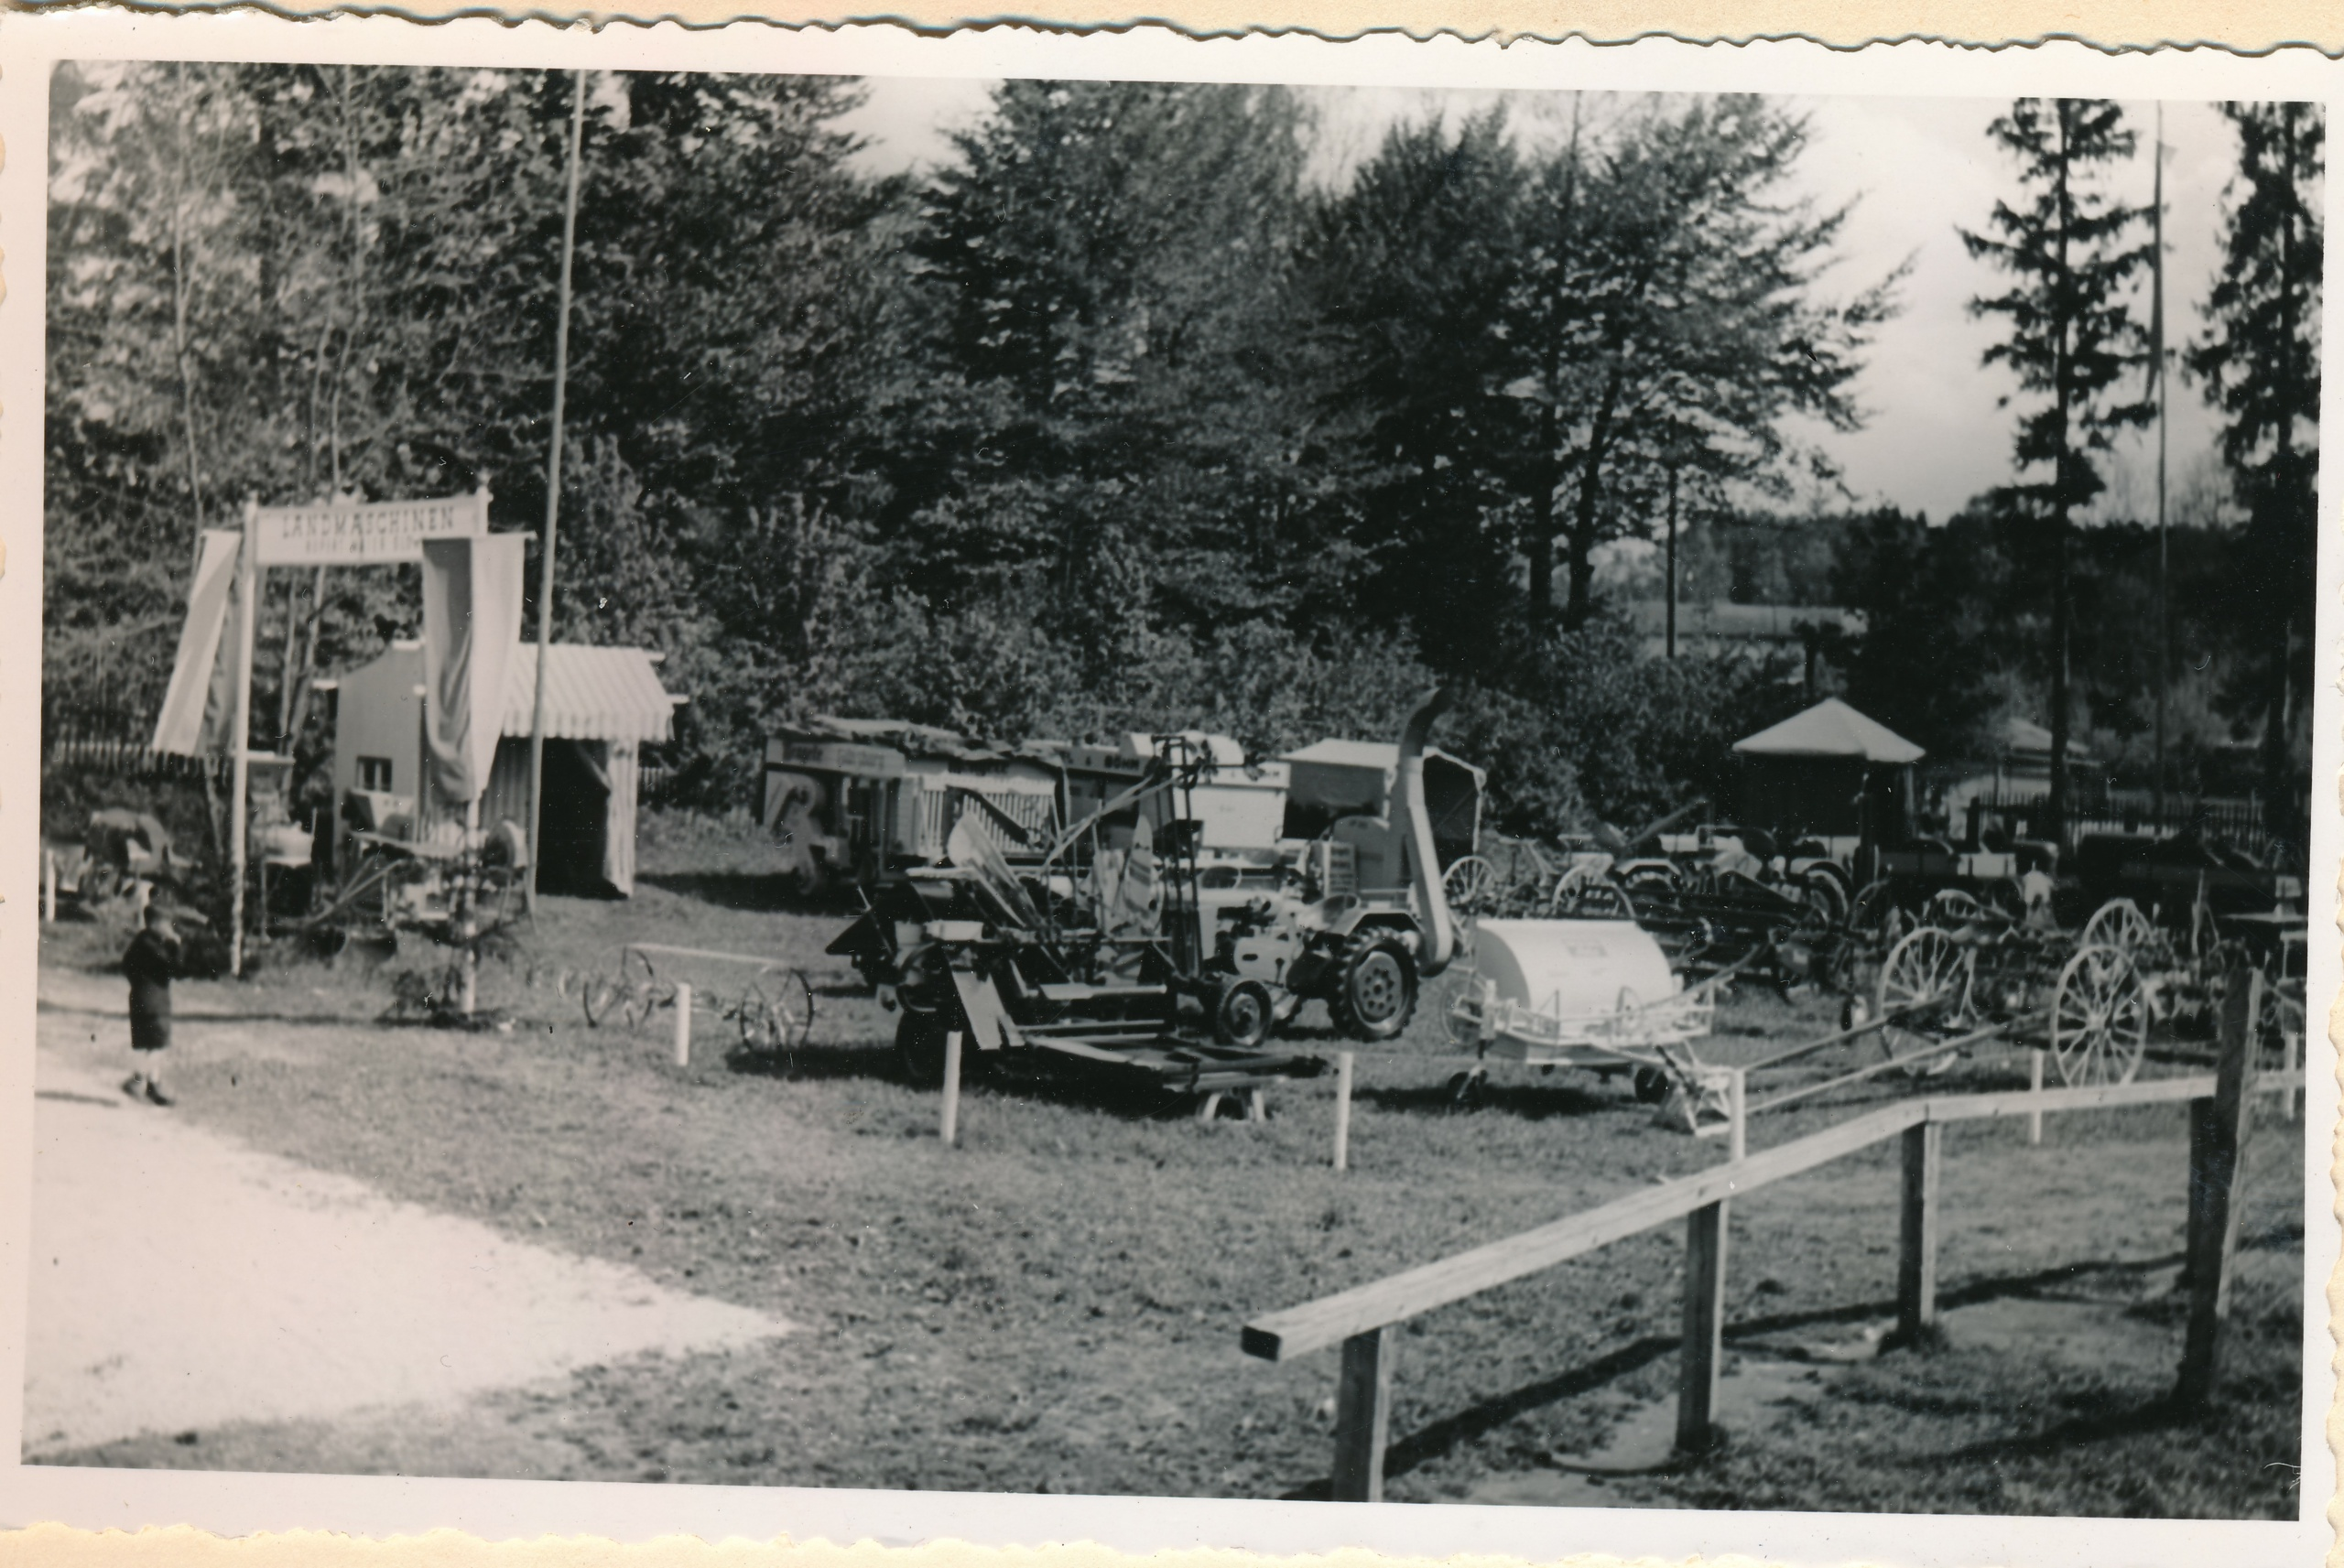 Landmaschinenausstellung